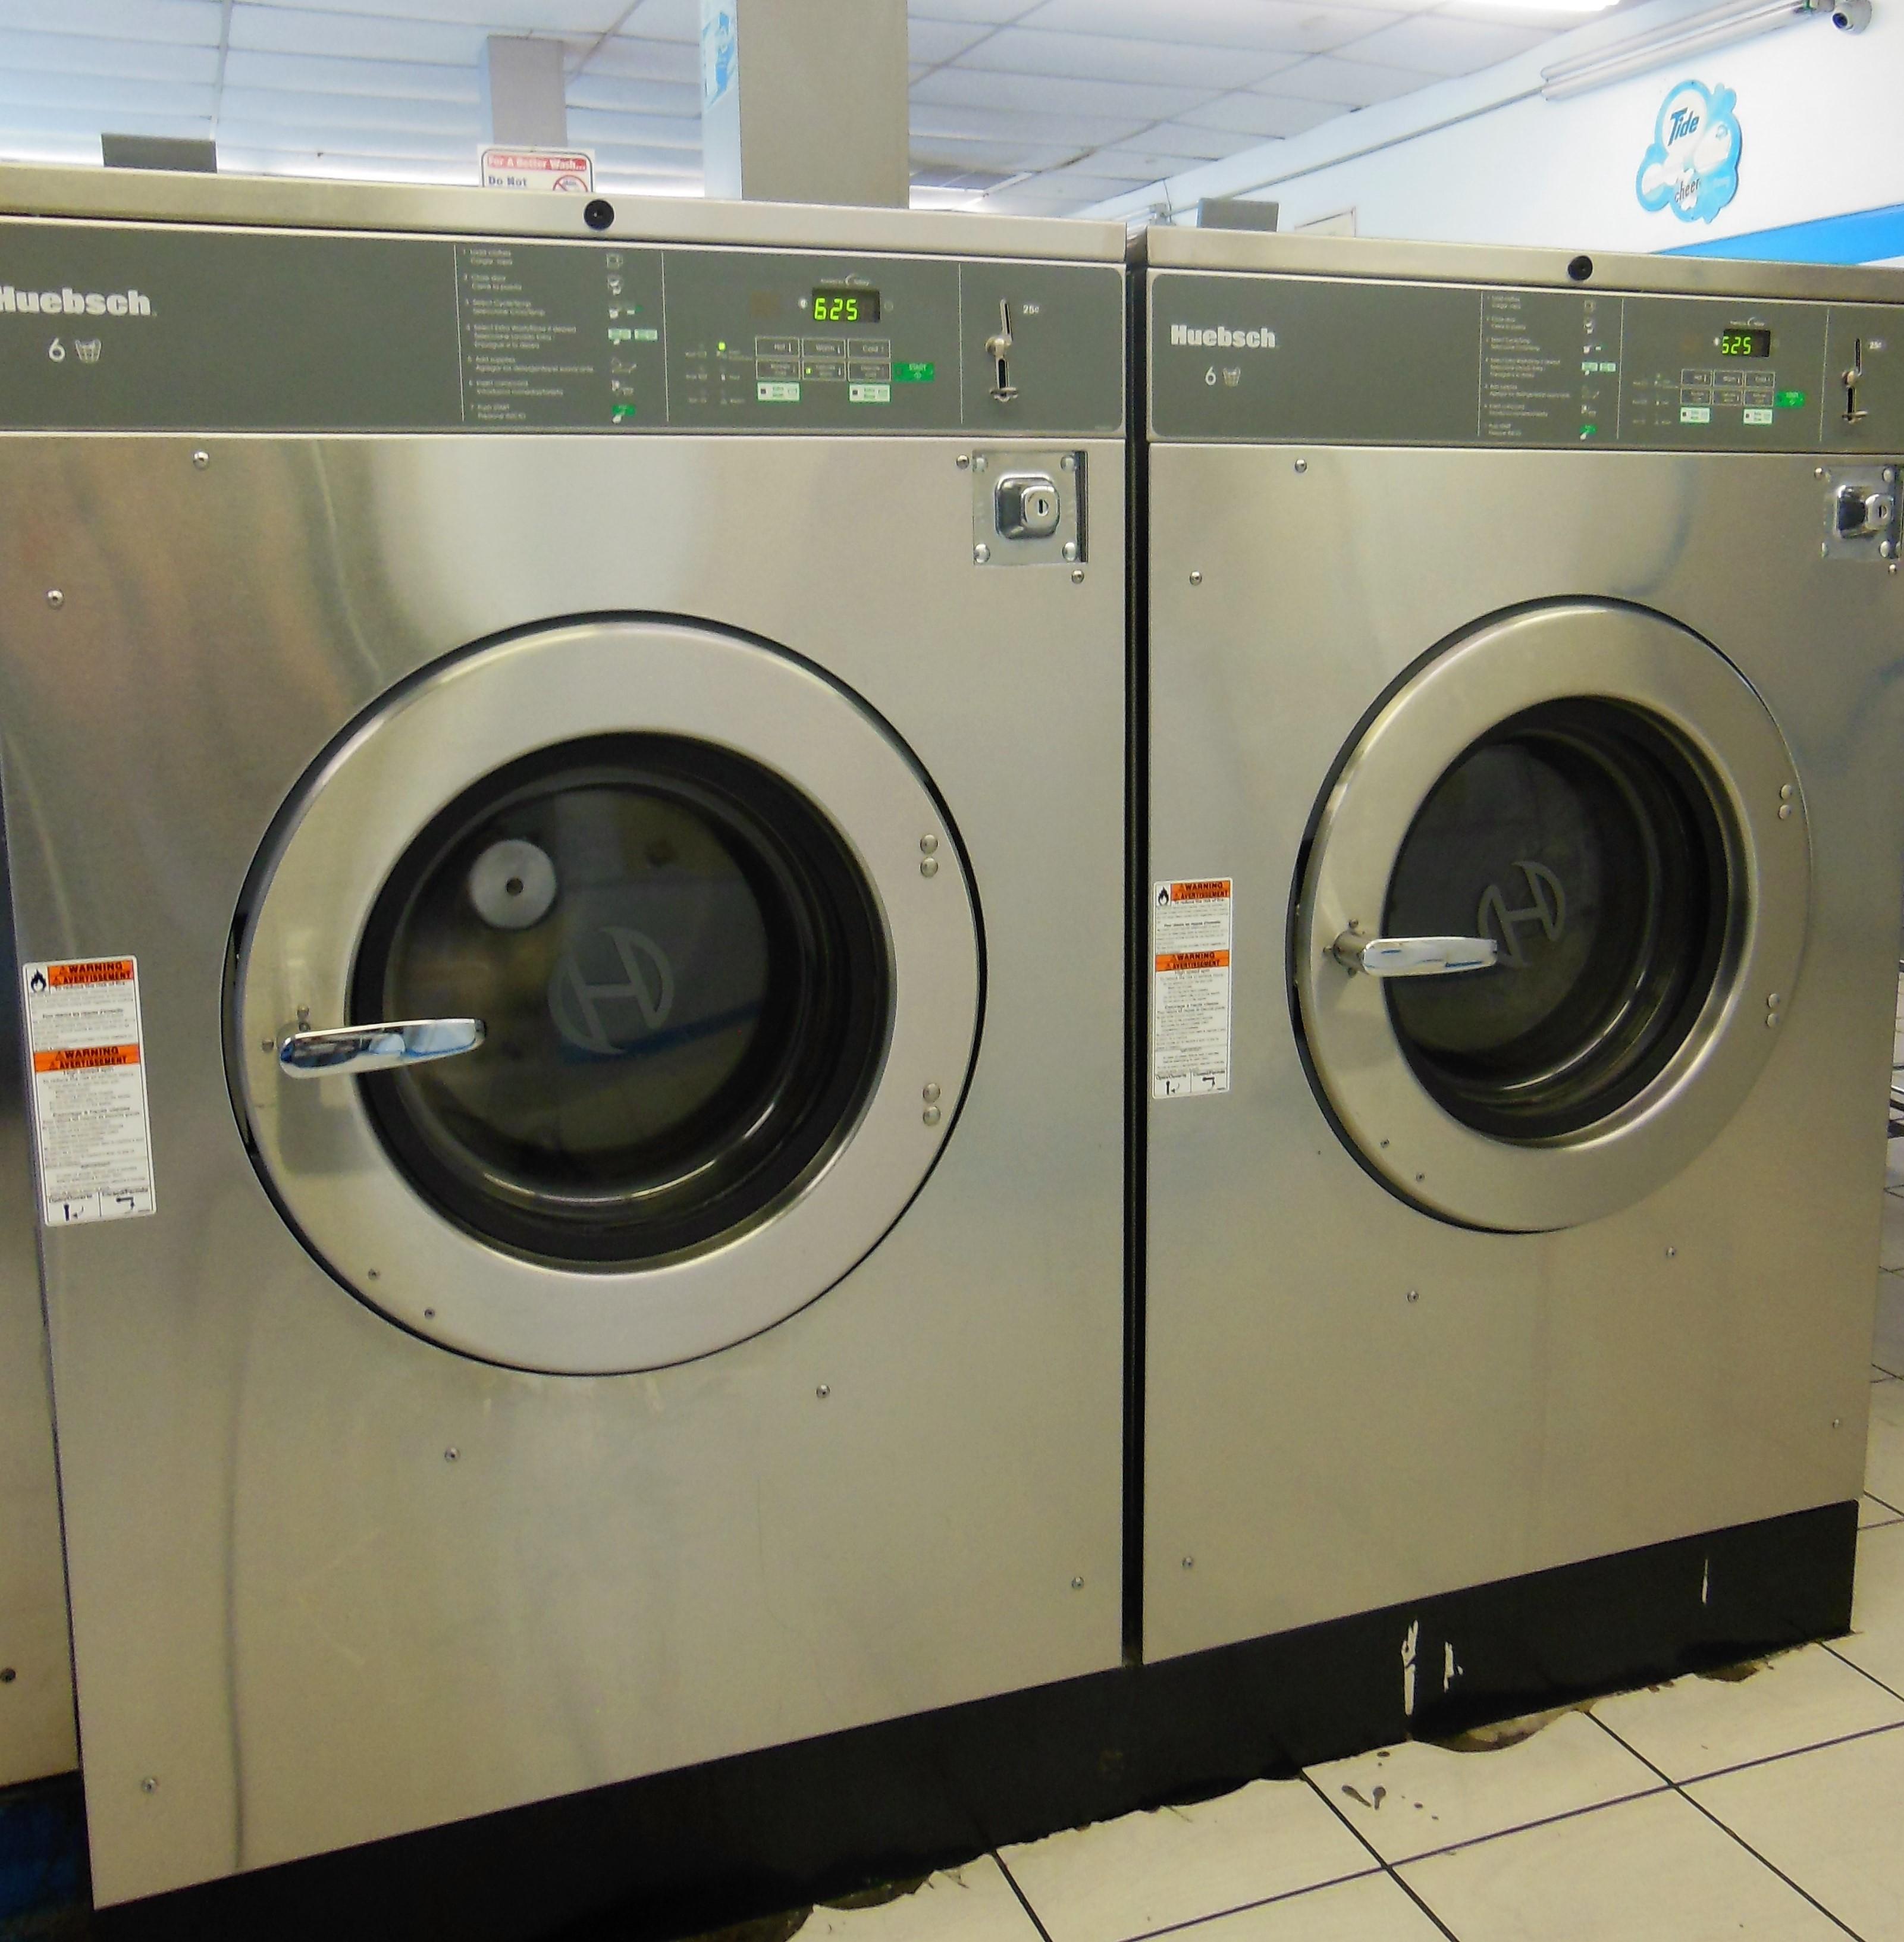 Palm River Square Laundromat image 1